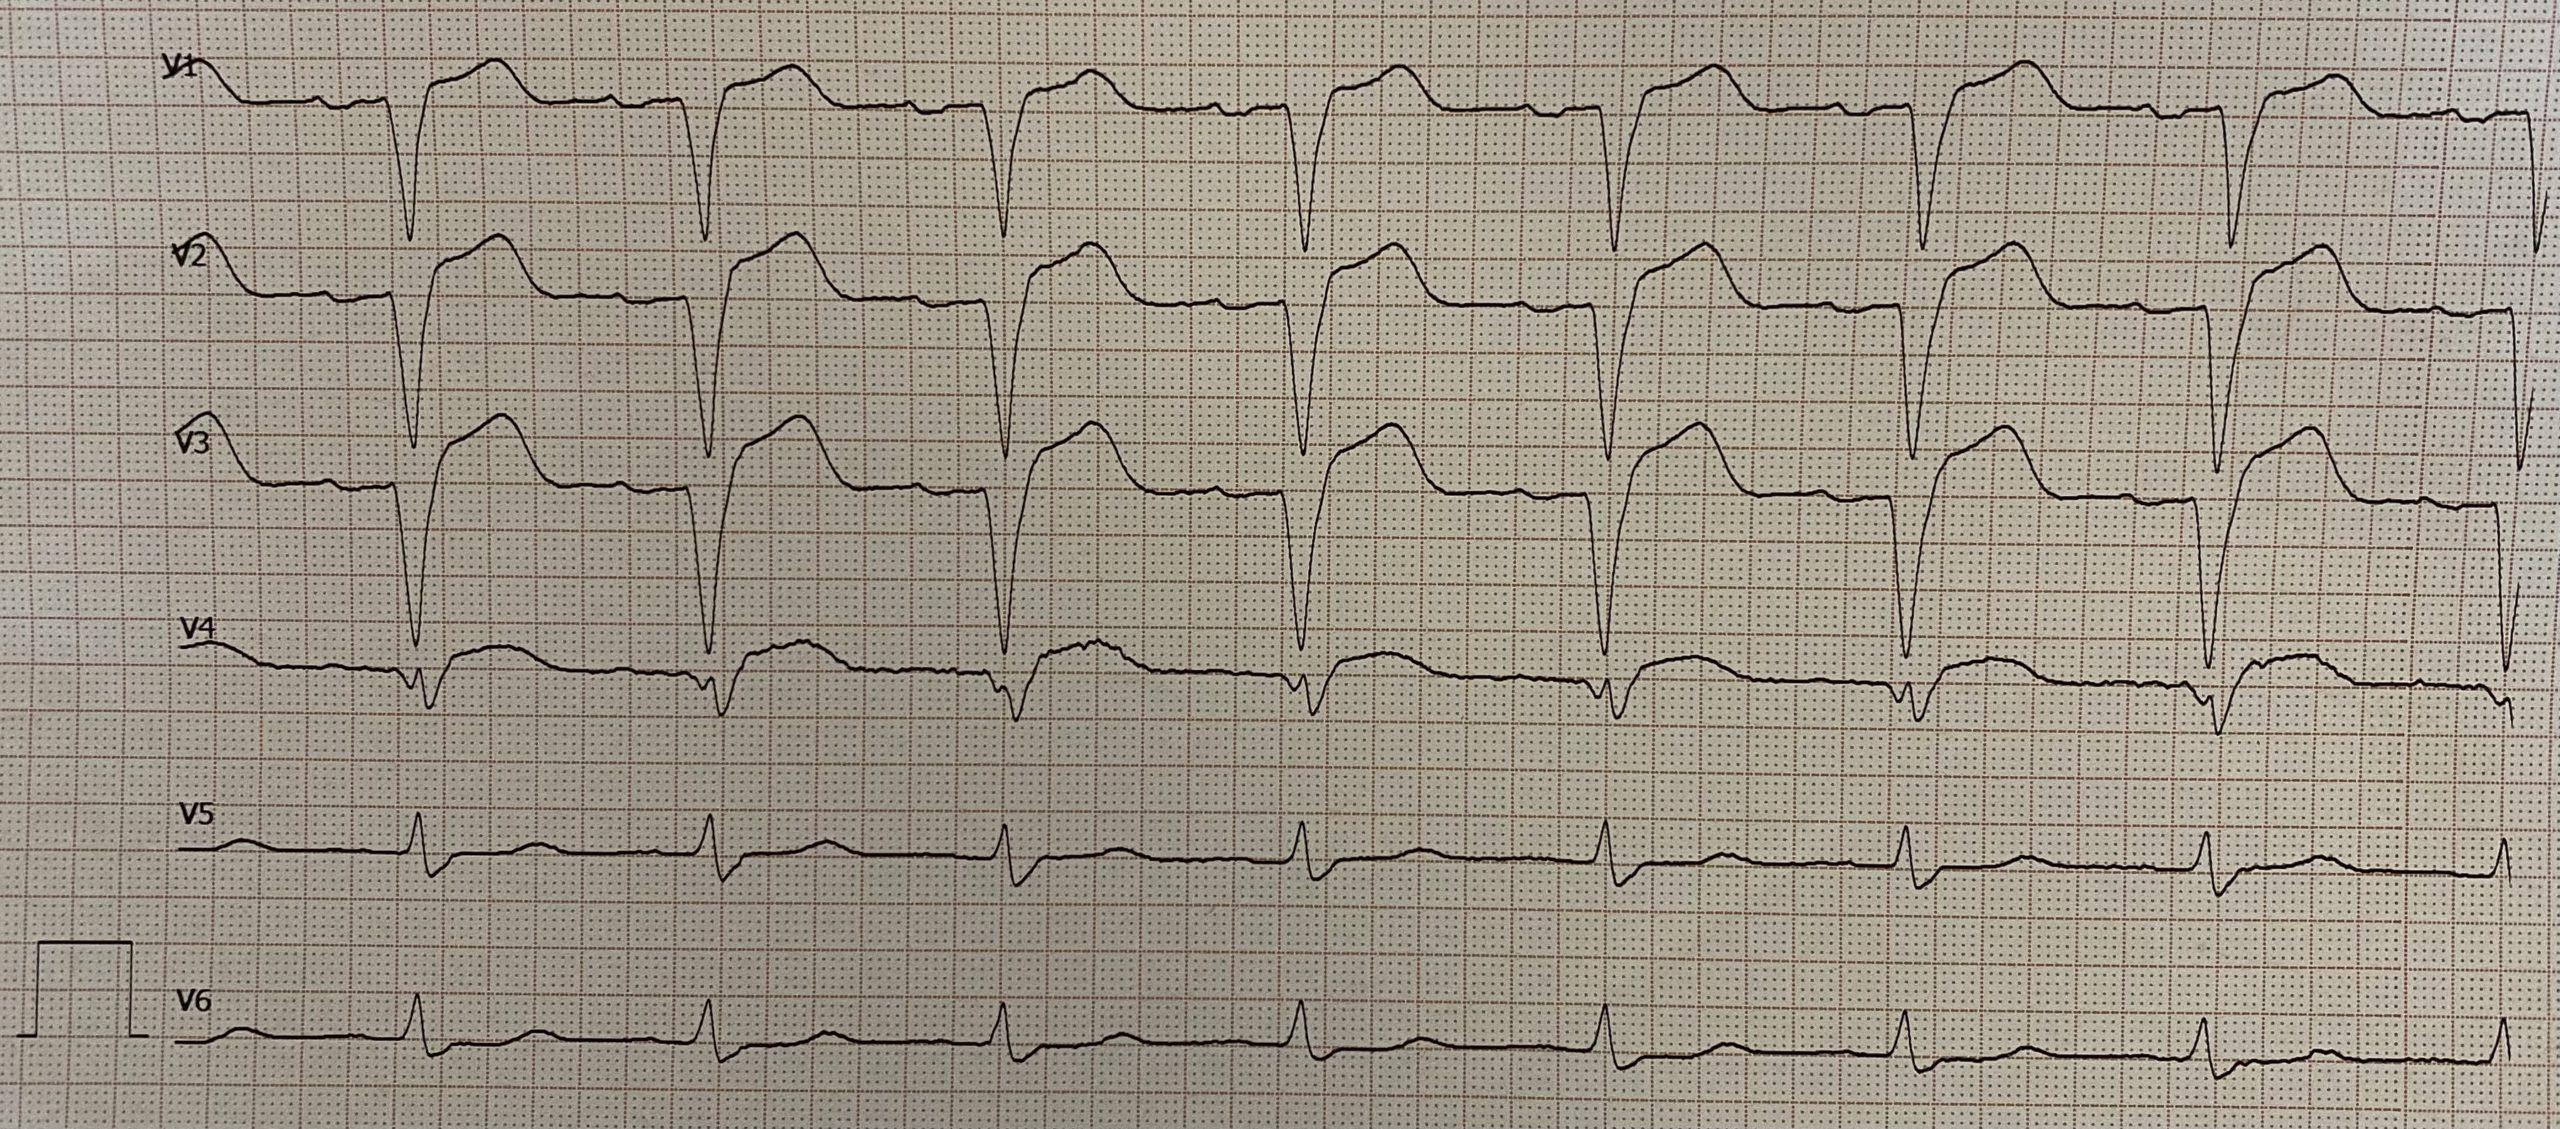 EKG 2 - STEMI